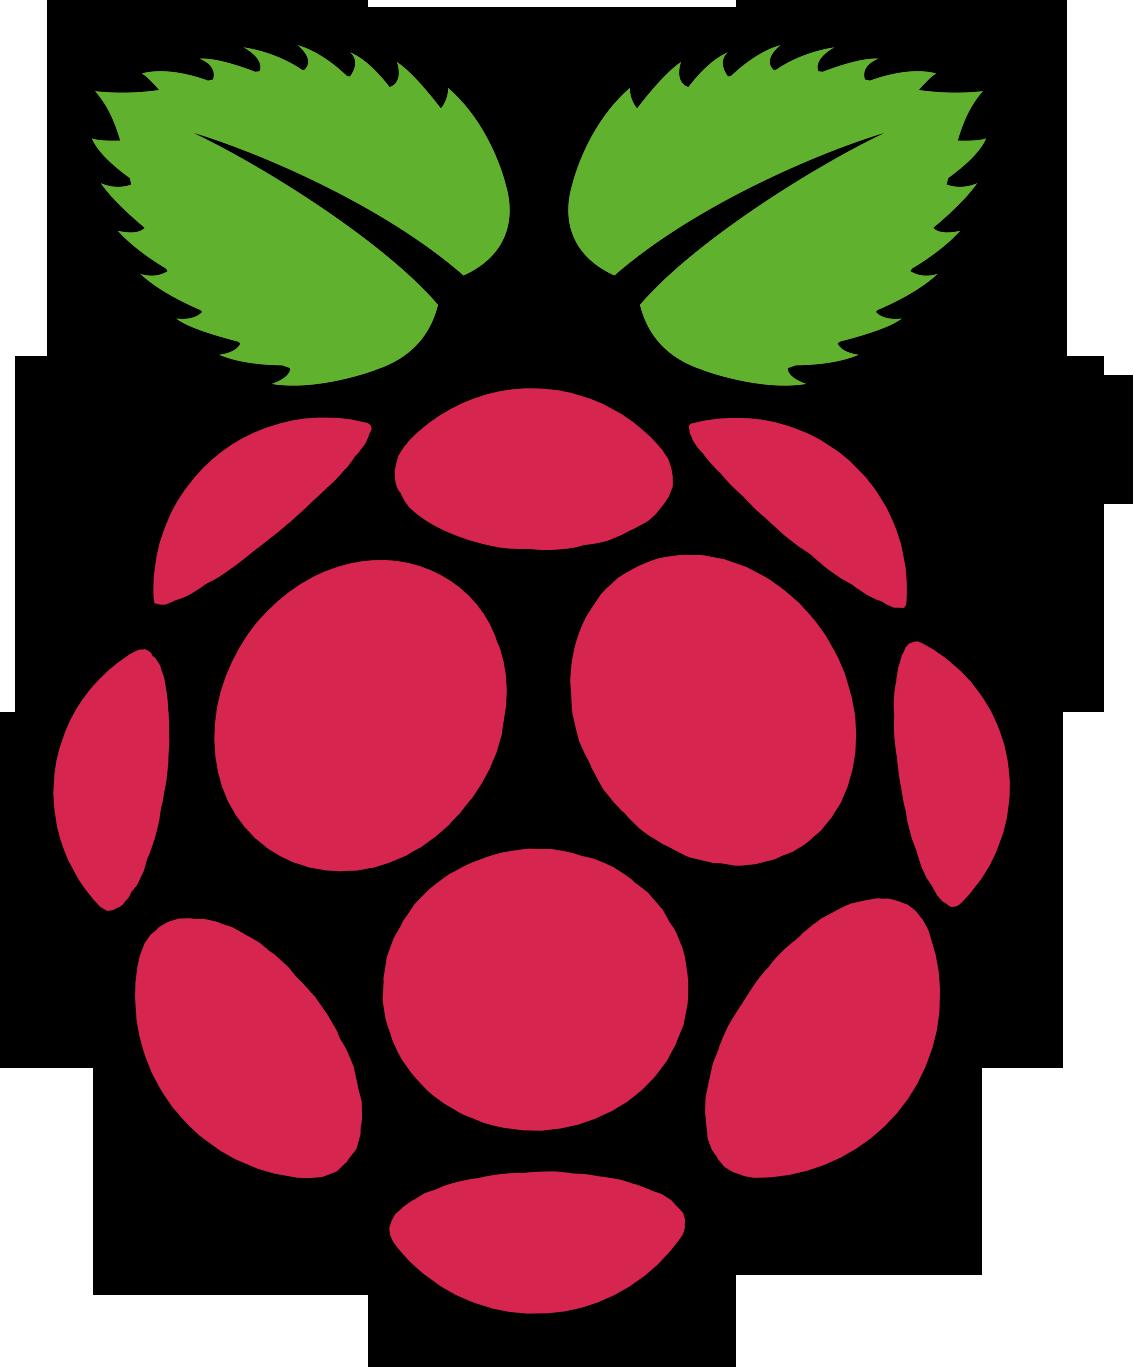 Raspberry Pi Logo Wallpaper